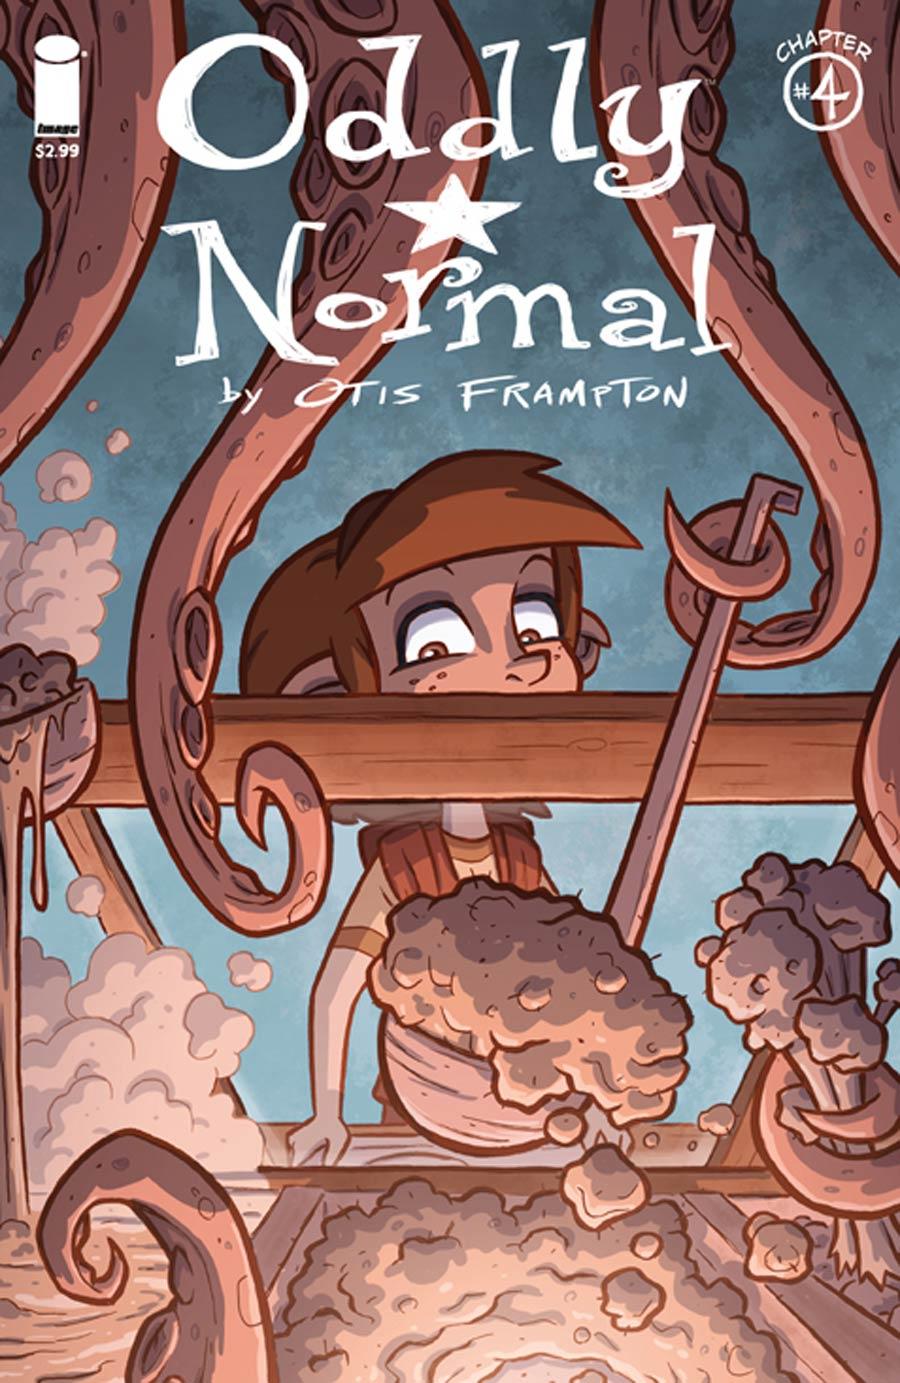 Oddly Normal Vol 2 #4 Cover A Otis Frampton